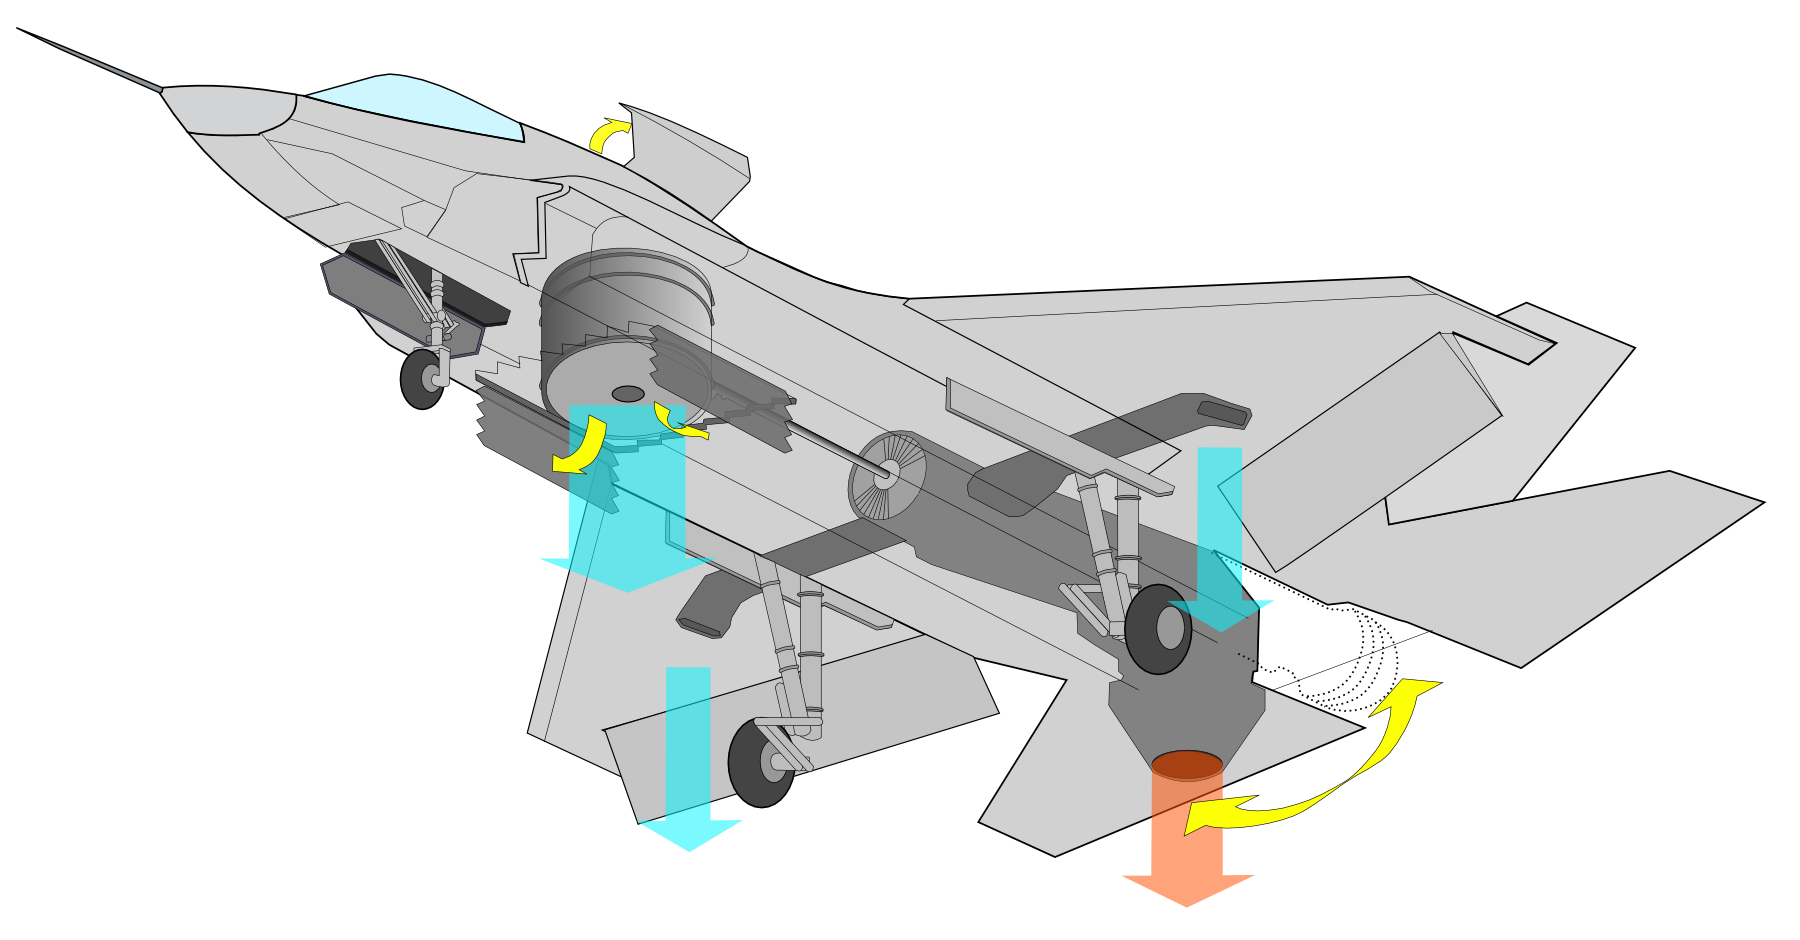 f135 engine diagram #9 f135 engine w p f135 engine diagram #9